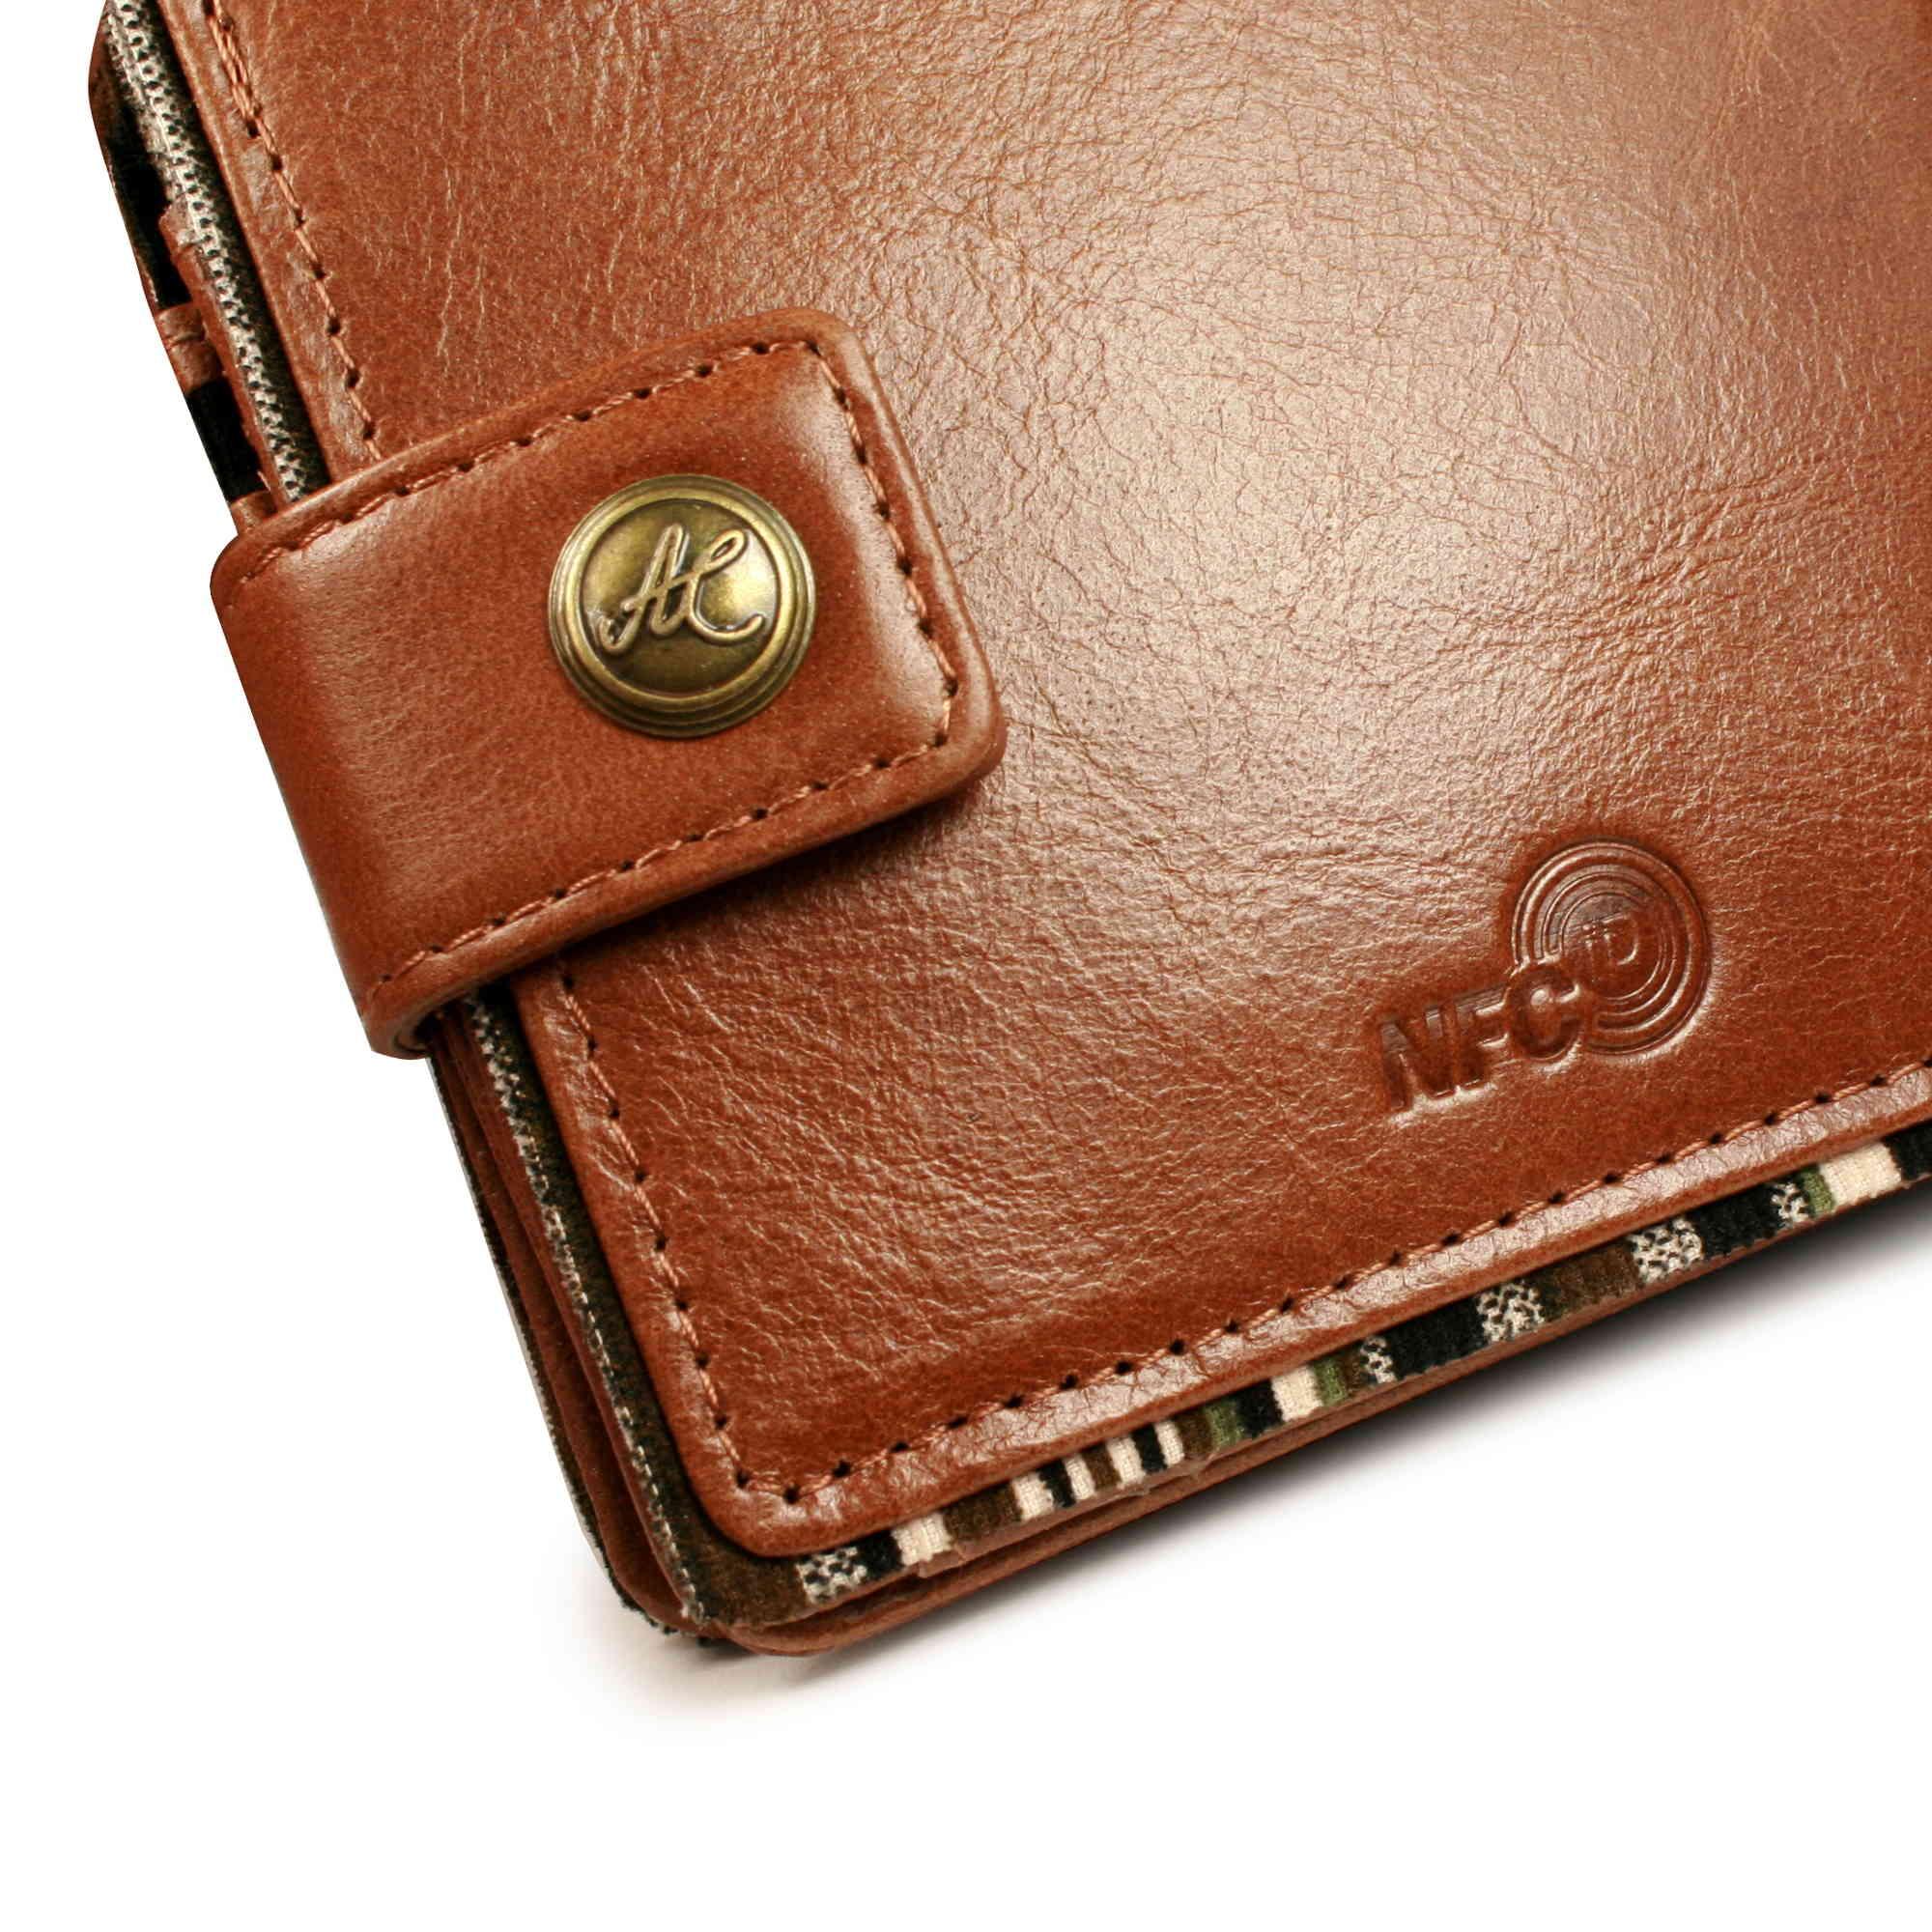 2bc8f1a4935bcc Sentinel Alston Craig Vintage Gen Leather RFID Blocking / NFC ID Mens Tec  wallet - Brown